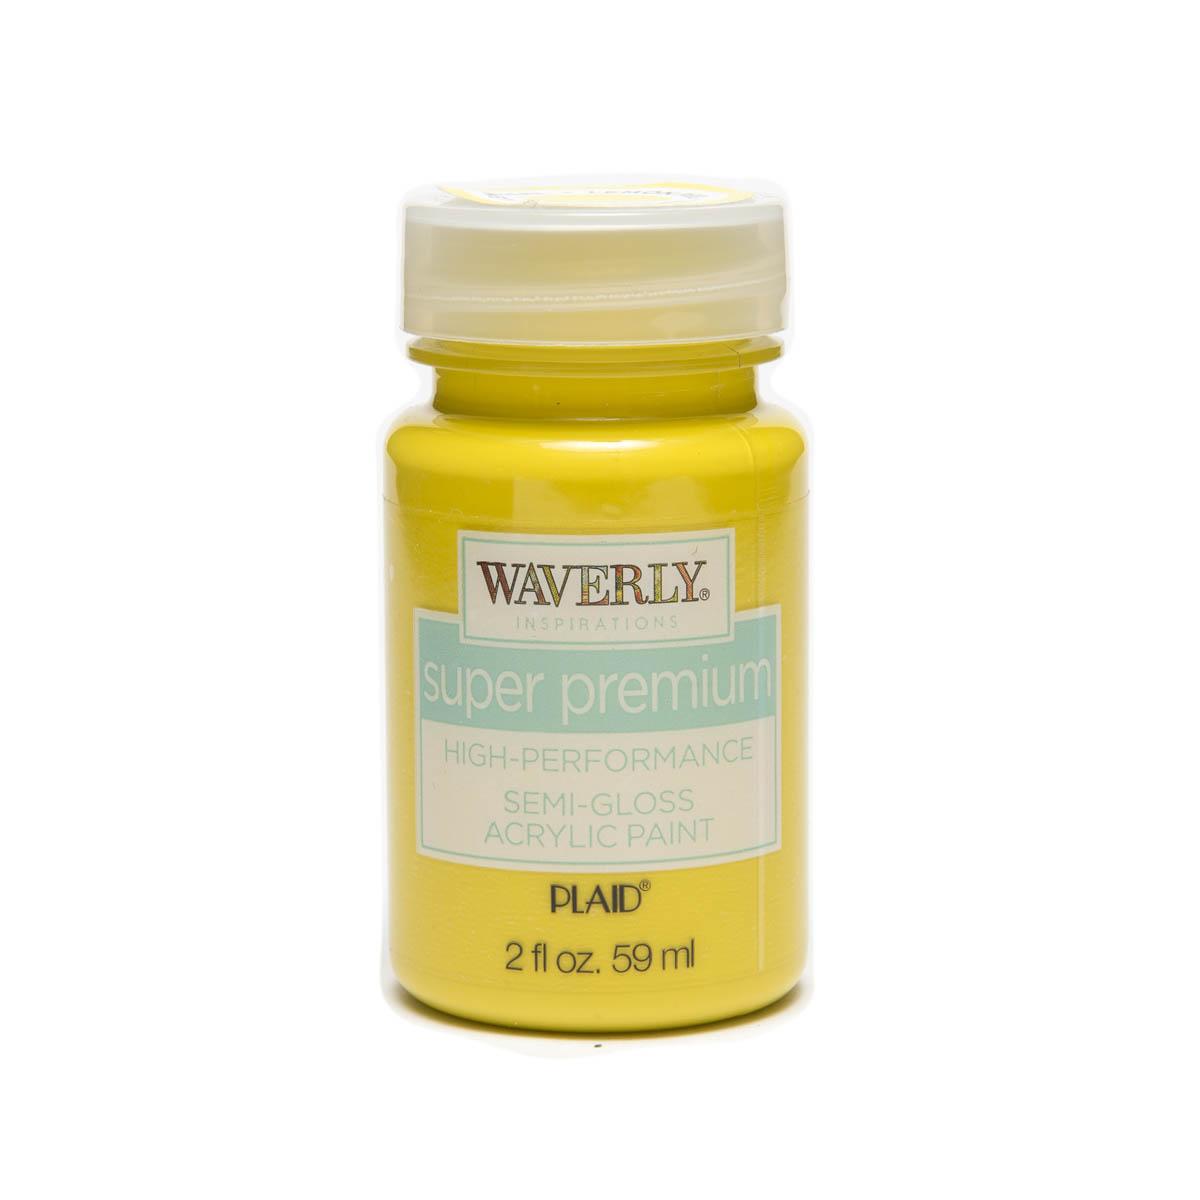 Waverly ® Inspirations Super Premium Semi-Gloss Acrylic Paint - Lemon Peel, 2 oz.